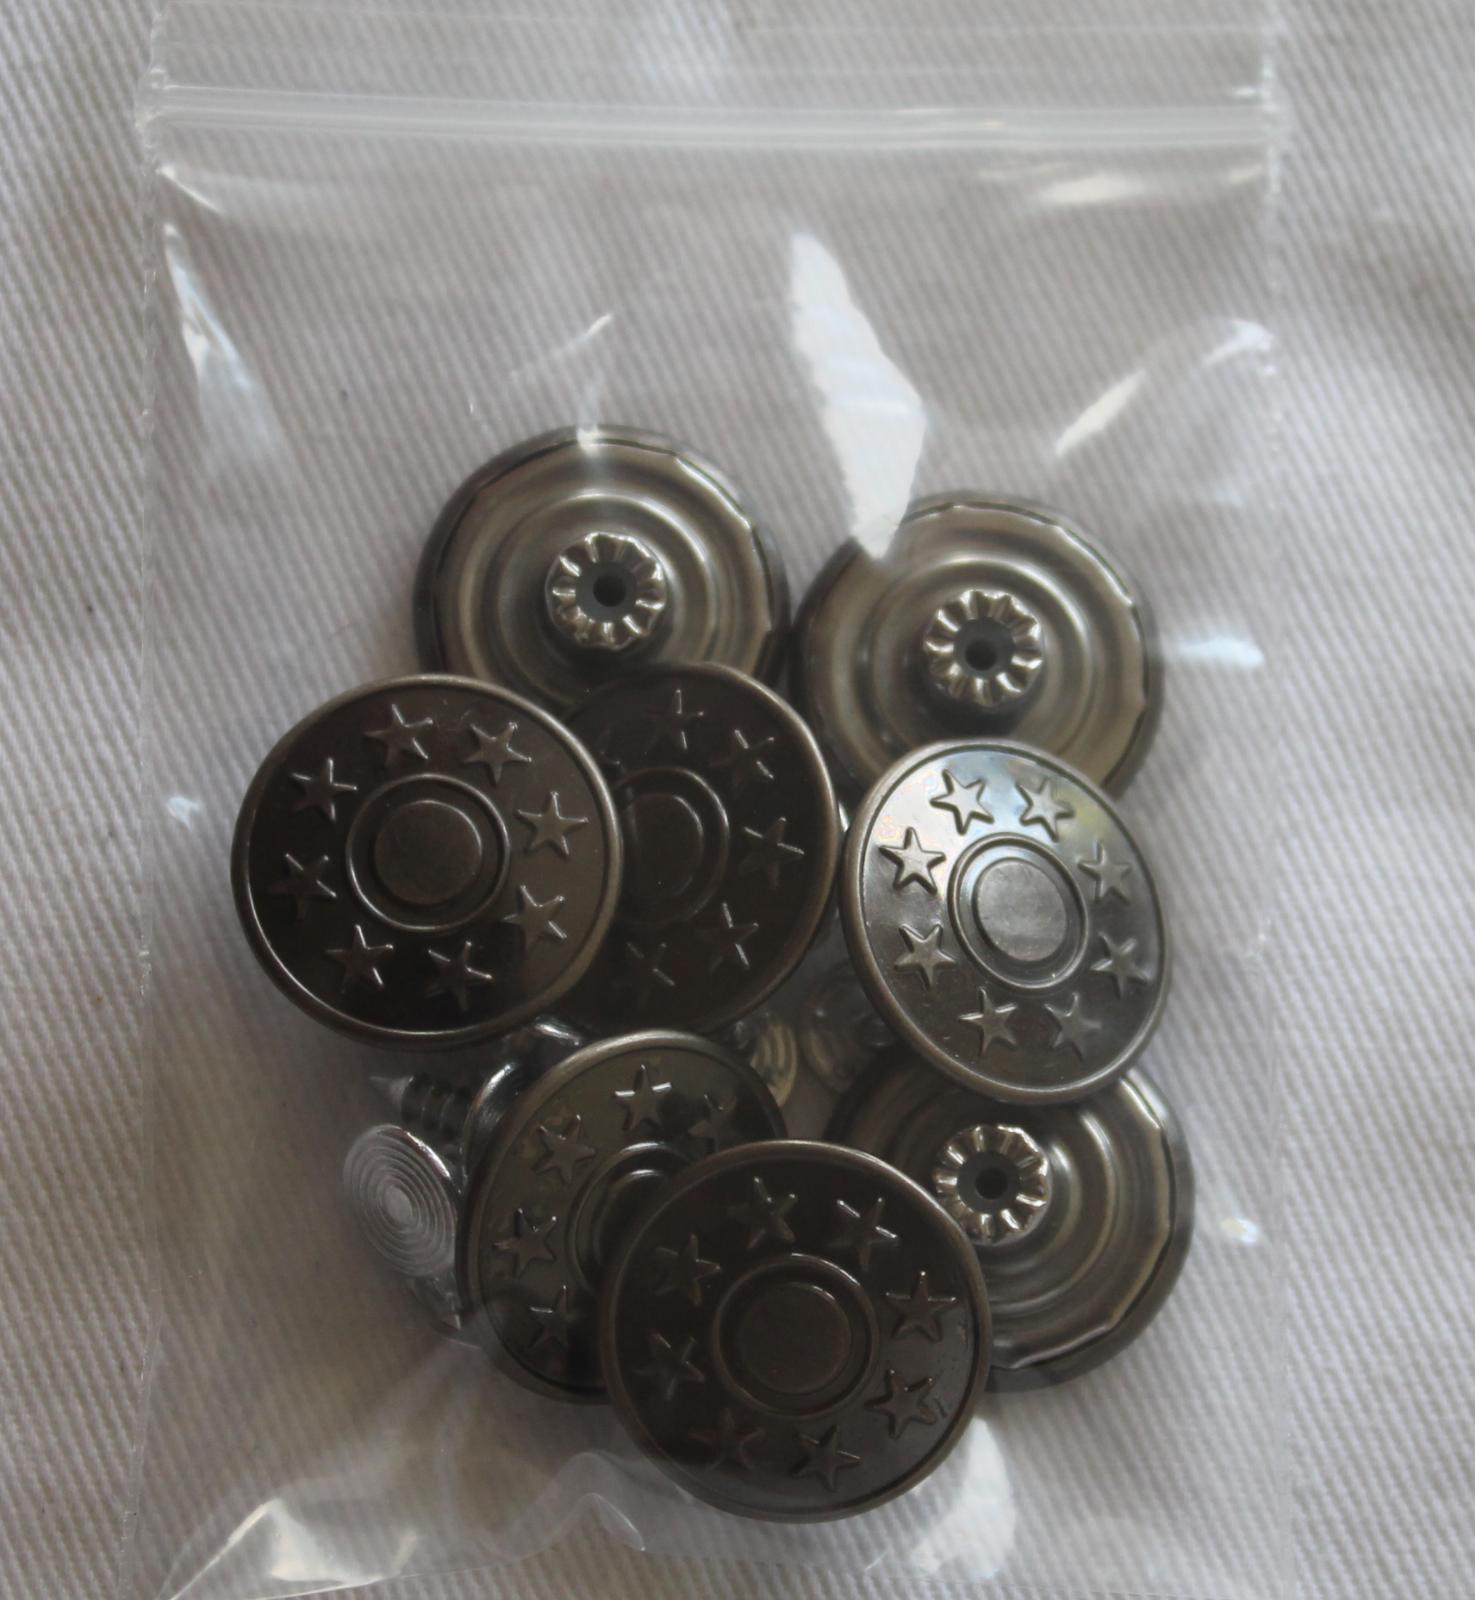 12 Stück Jeansknöpfe 17 mm inklusive 12 Stifte Altkupfer Hosenknöpfe Metalknöpf